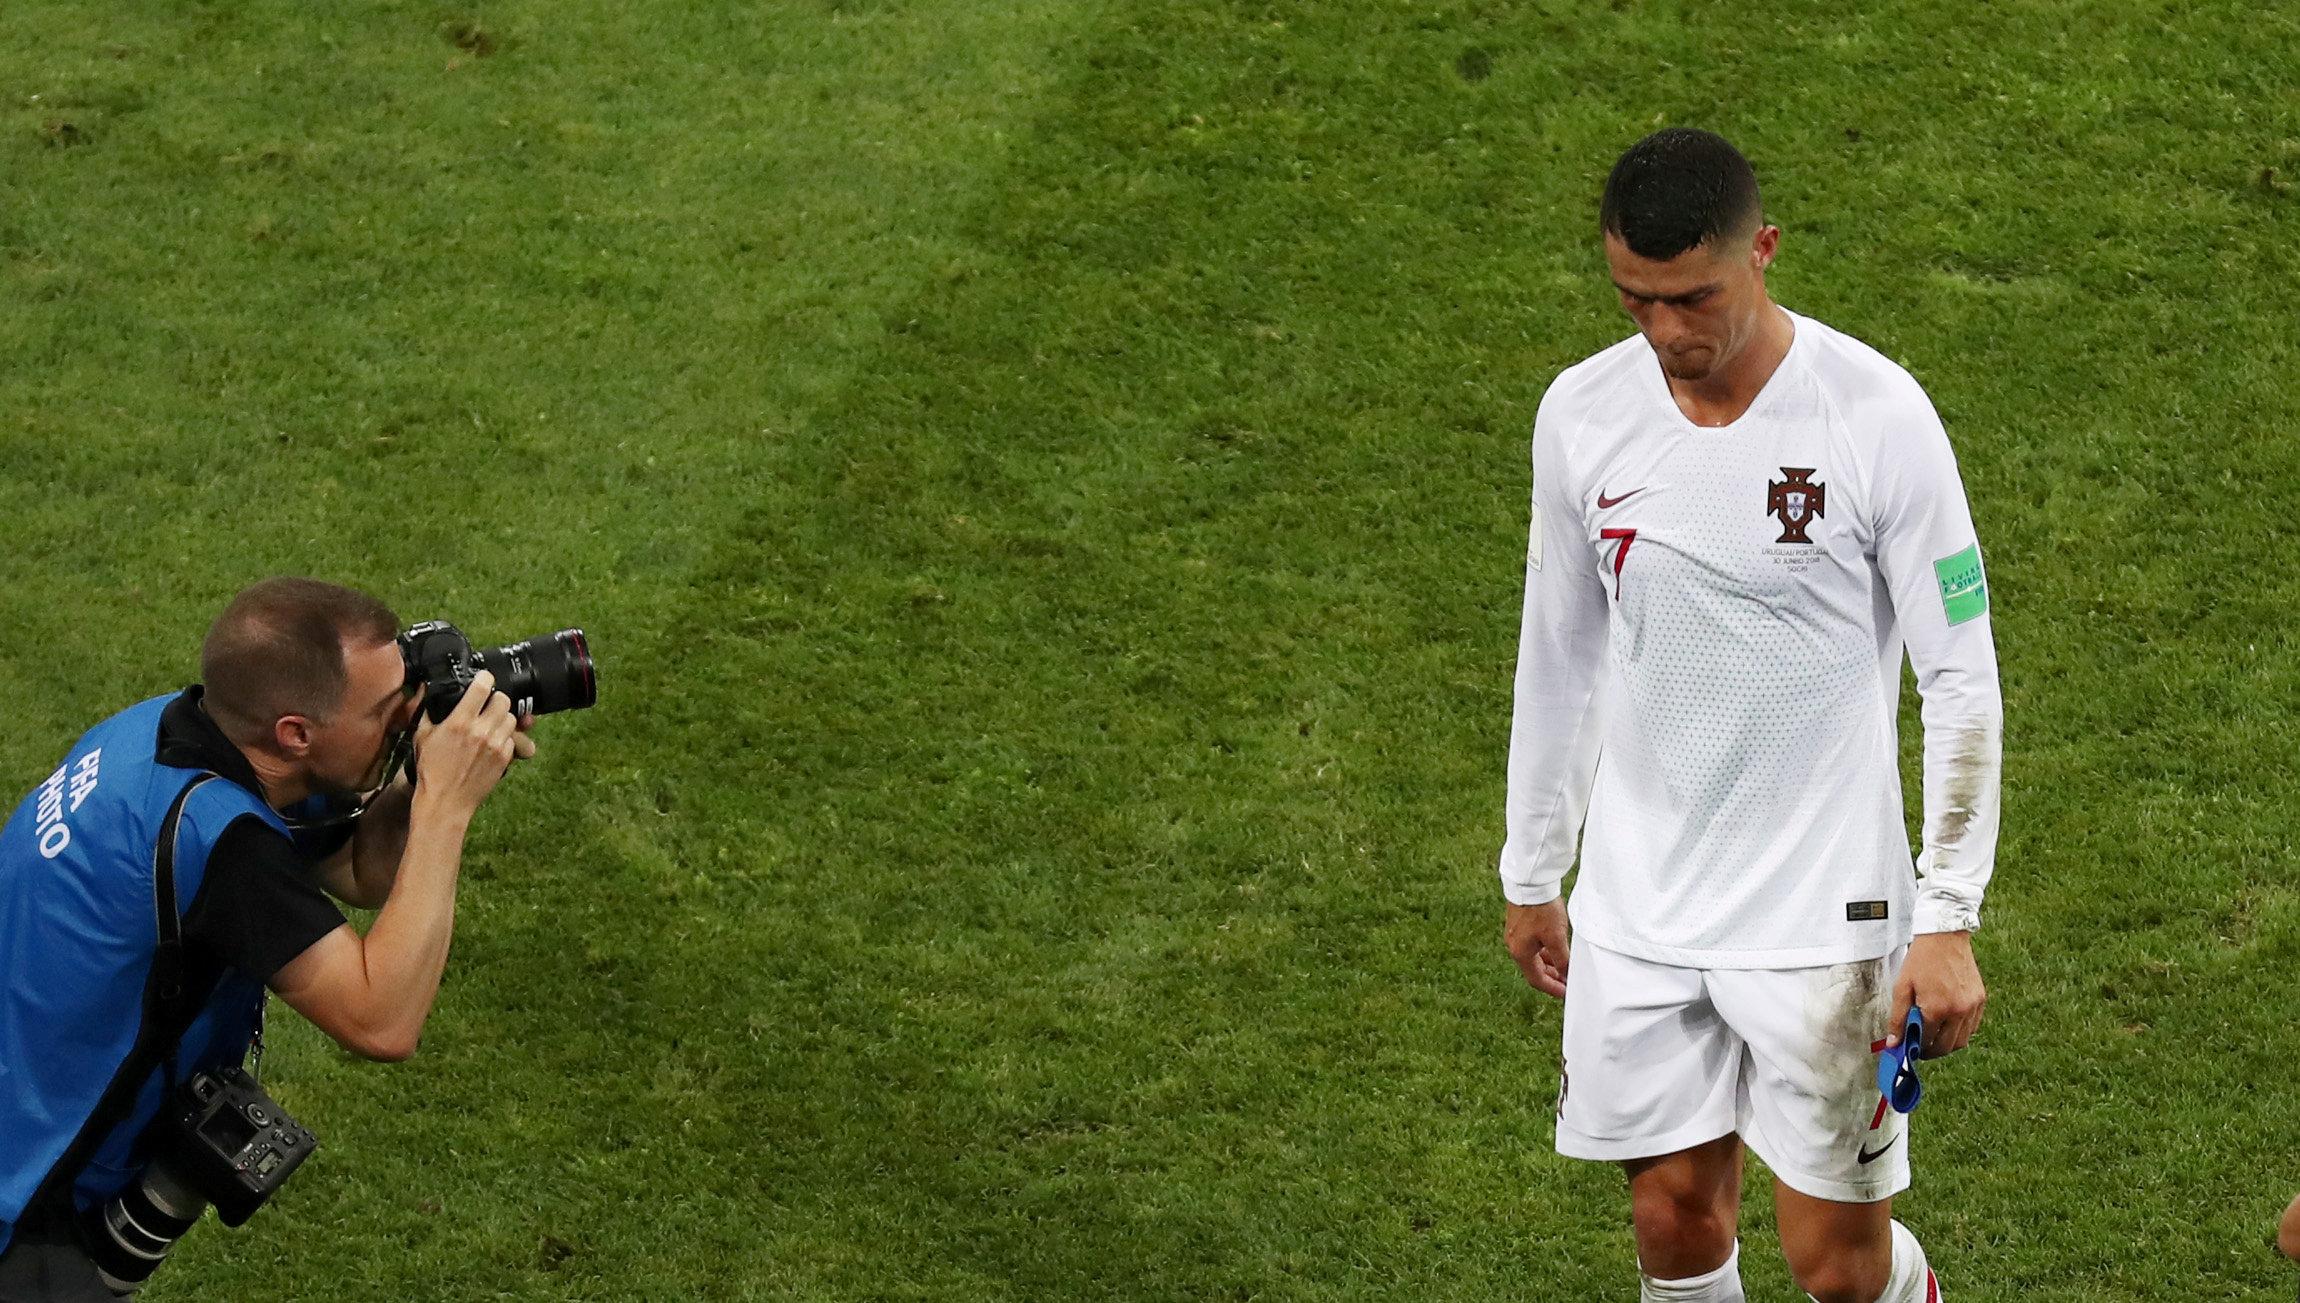 Alexis Sanchez Dipaksa Ganti Nomor Demi Beri Jalan Ronaldo